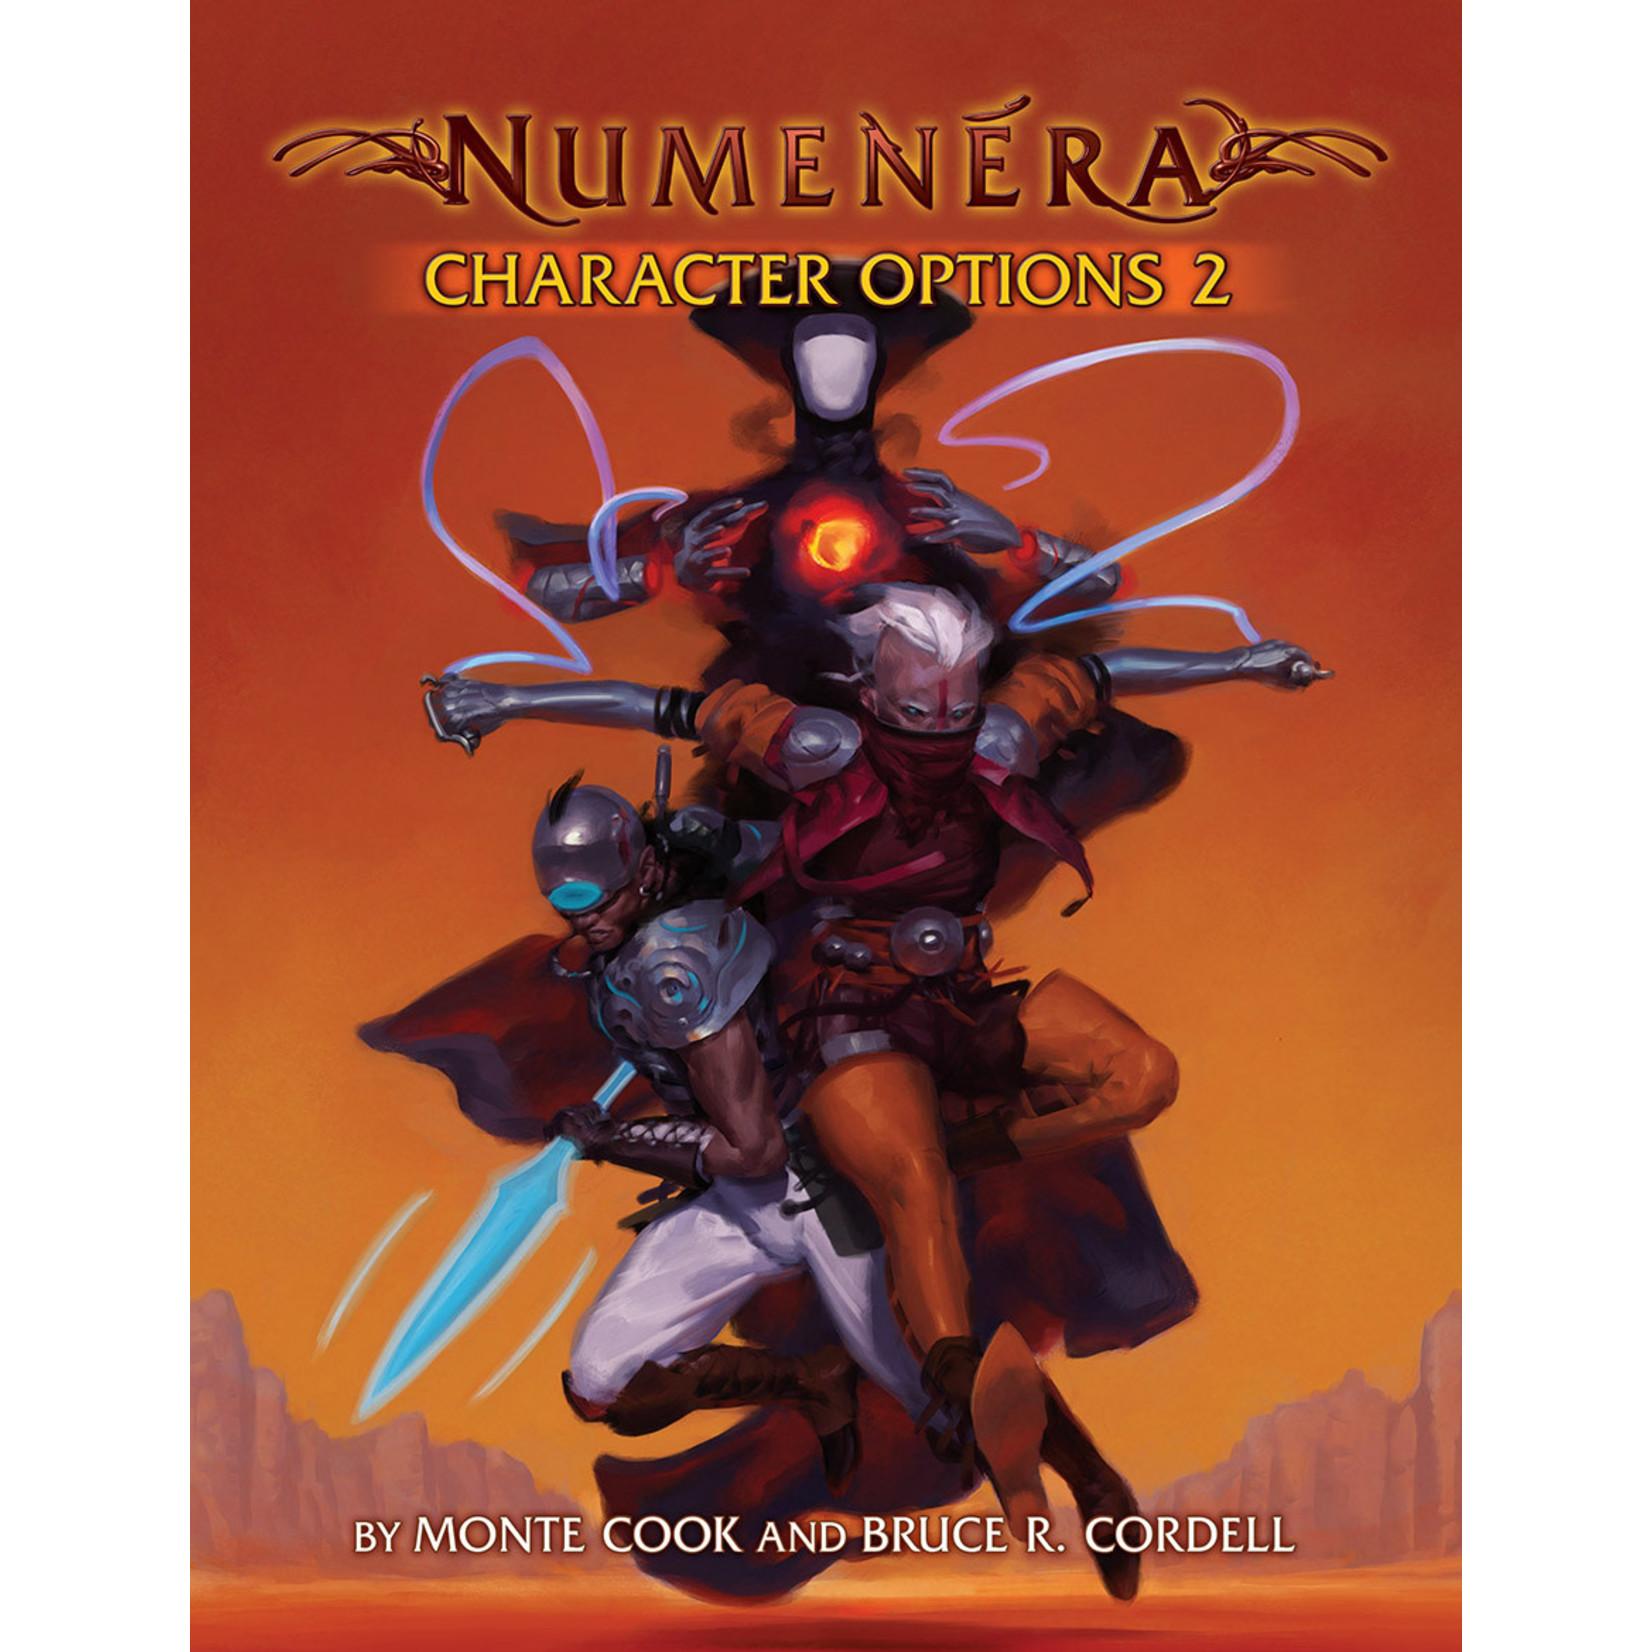 Numenera RPG Character Options 2